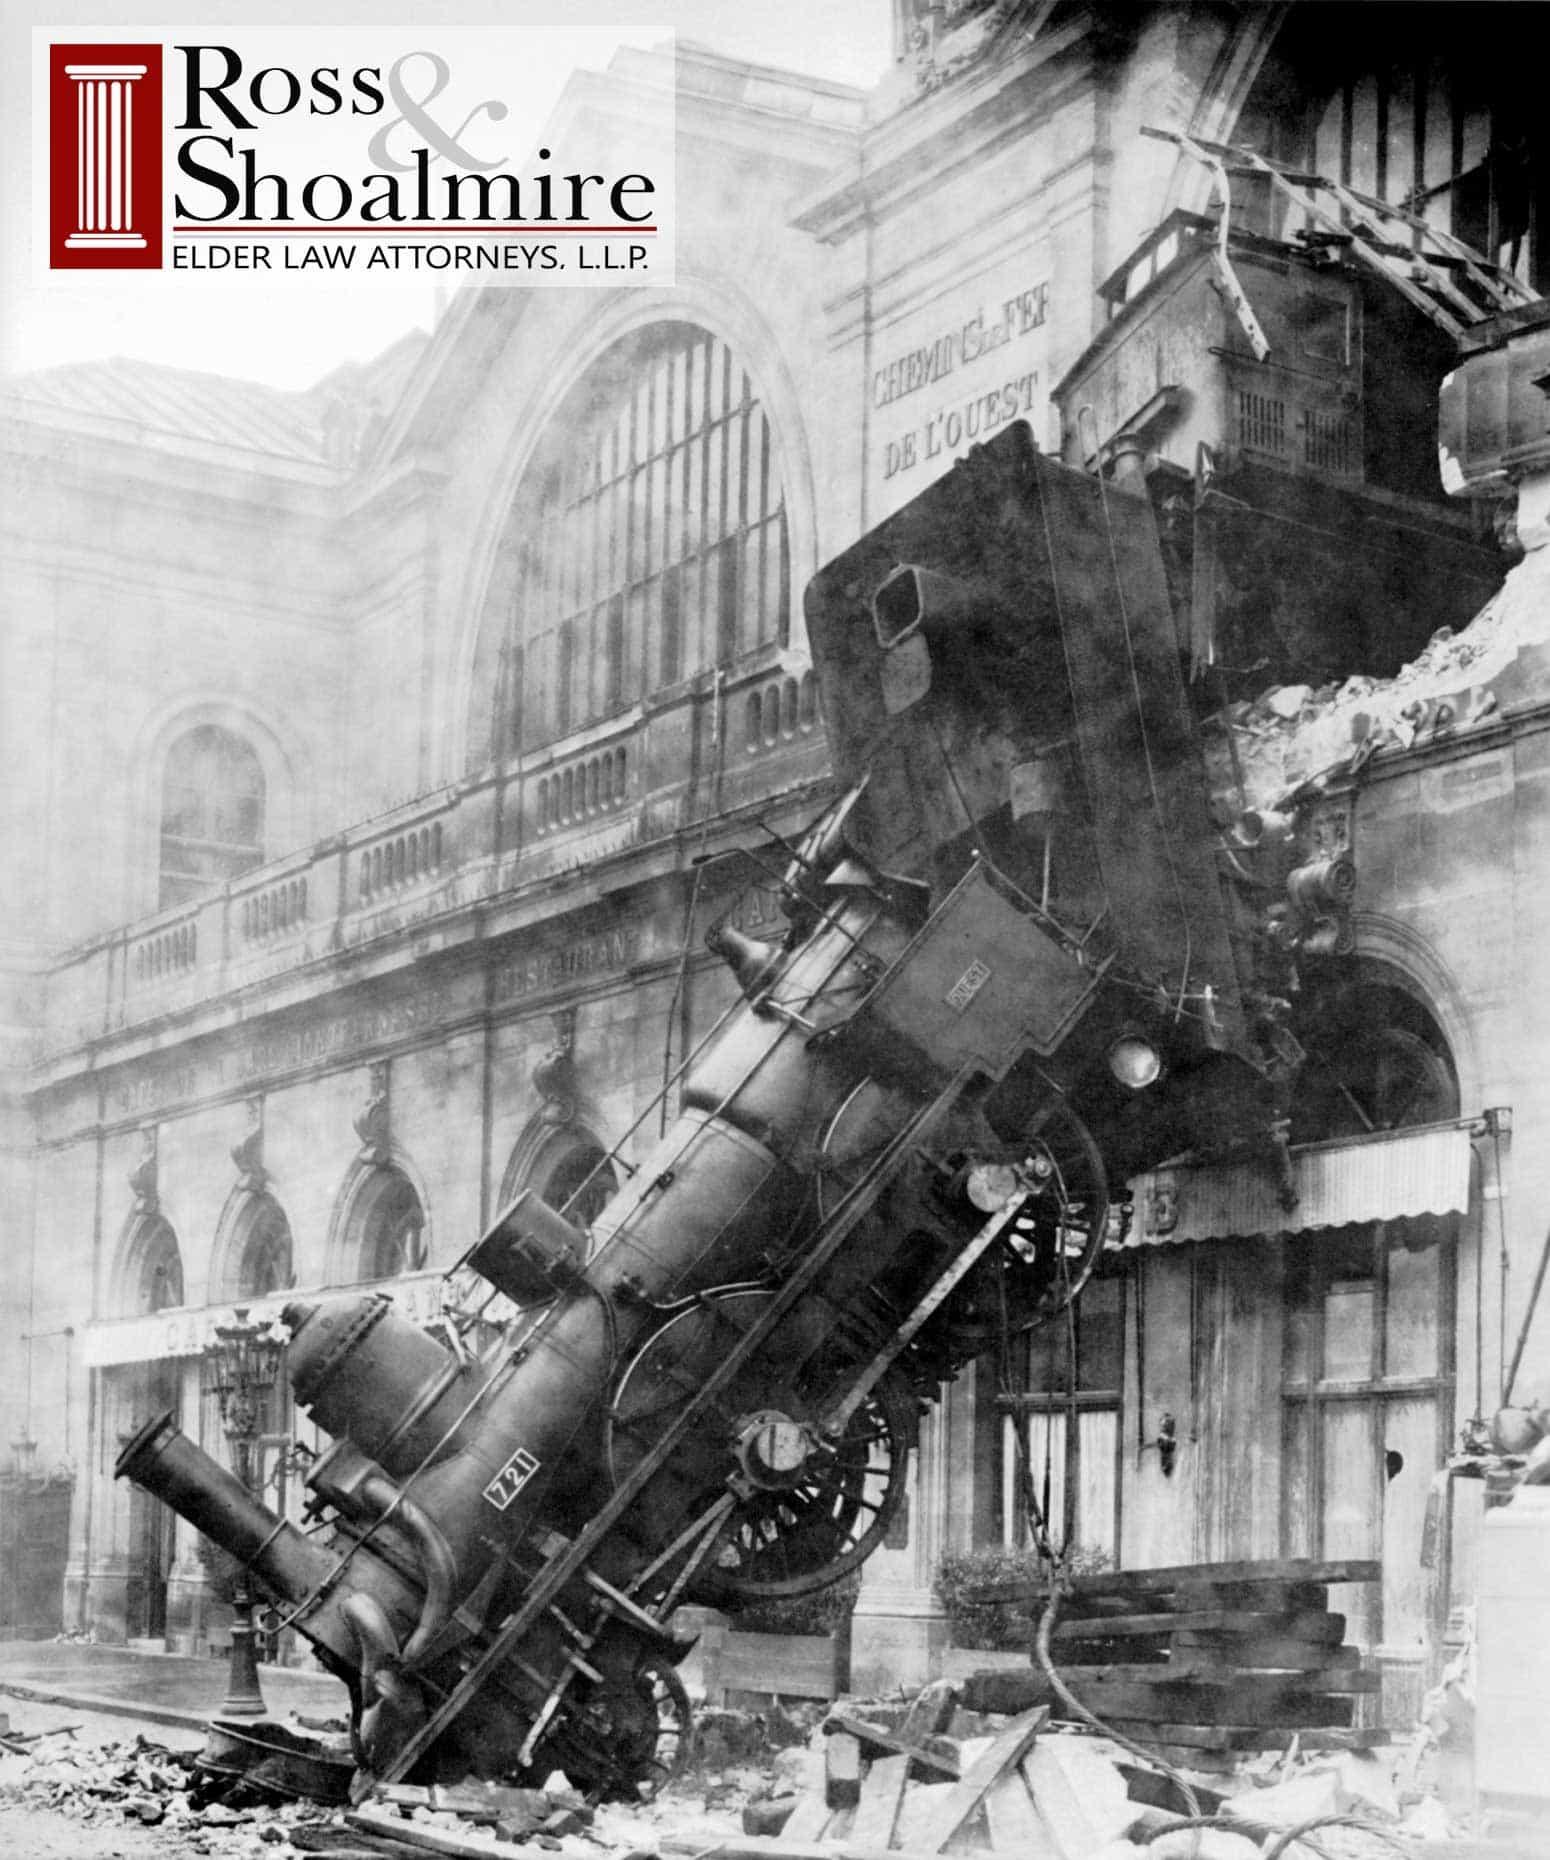 train-wreck-bad-idea-shouldnt-have-done